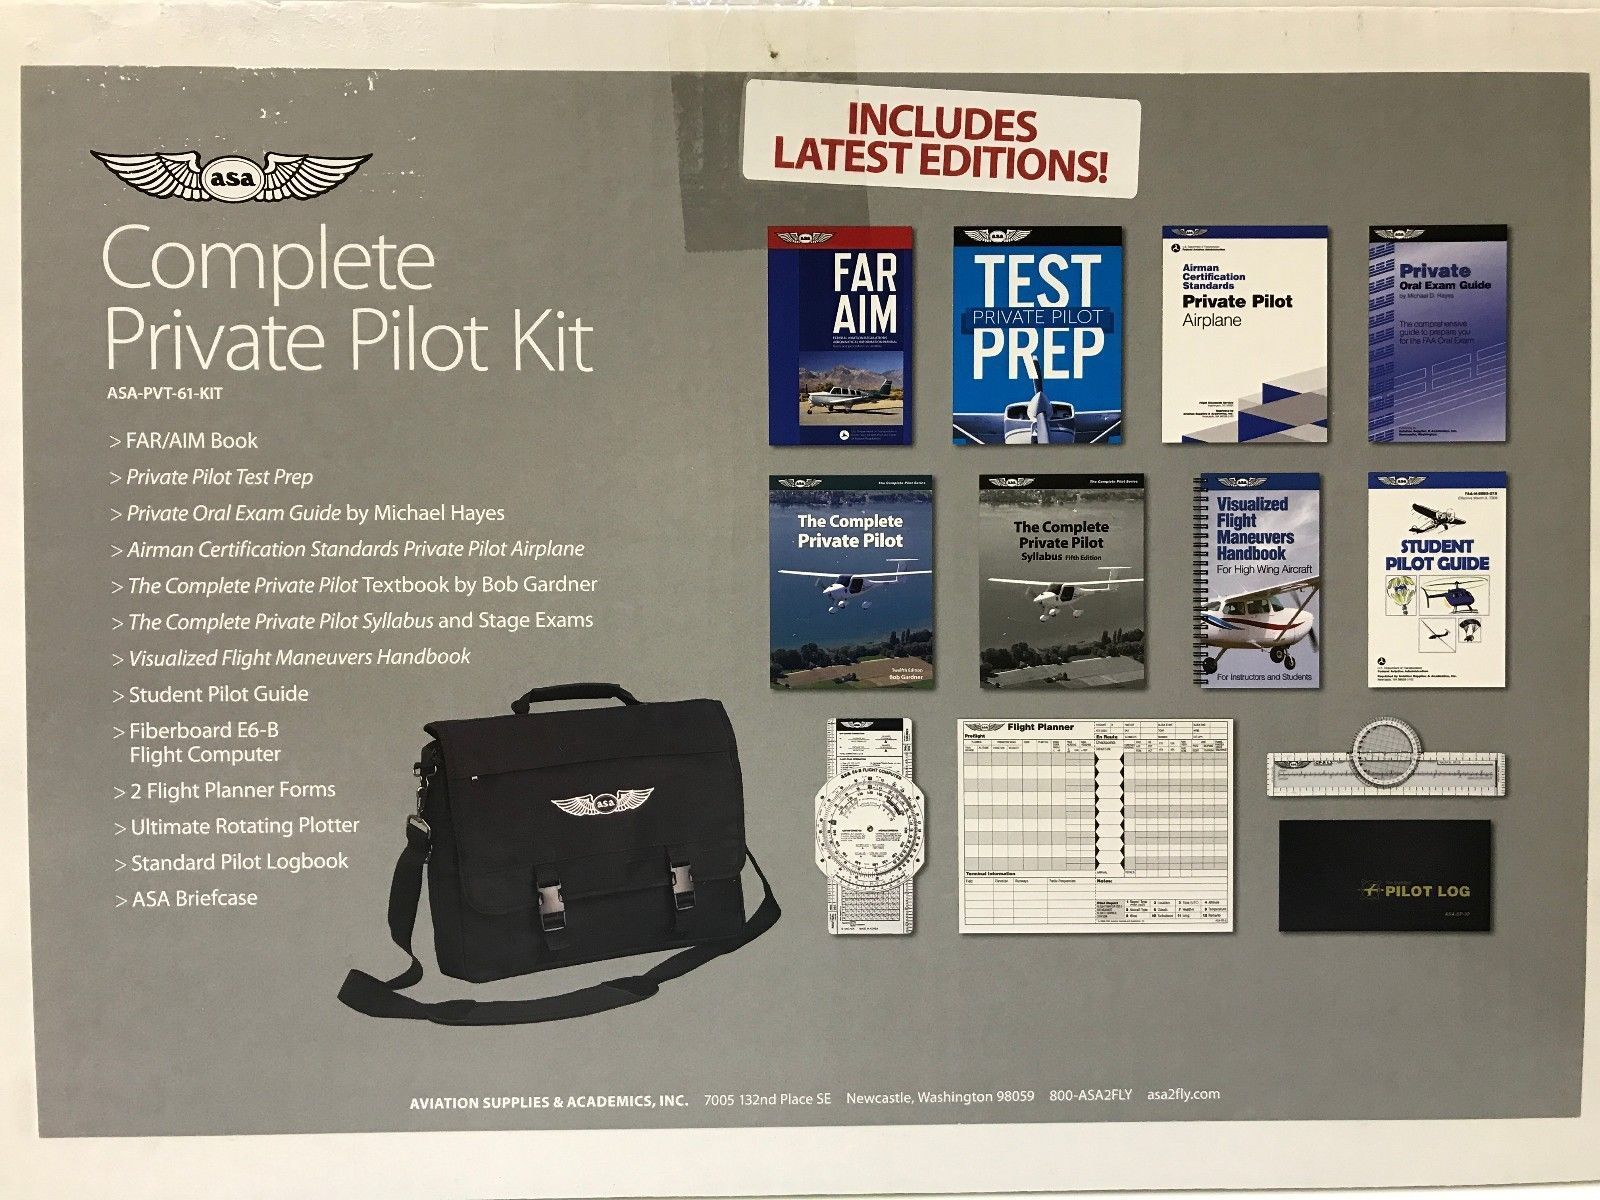 ASA, Complete Private Pilot Kit, Part 61, 2019 Edition, p/n